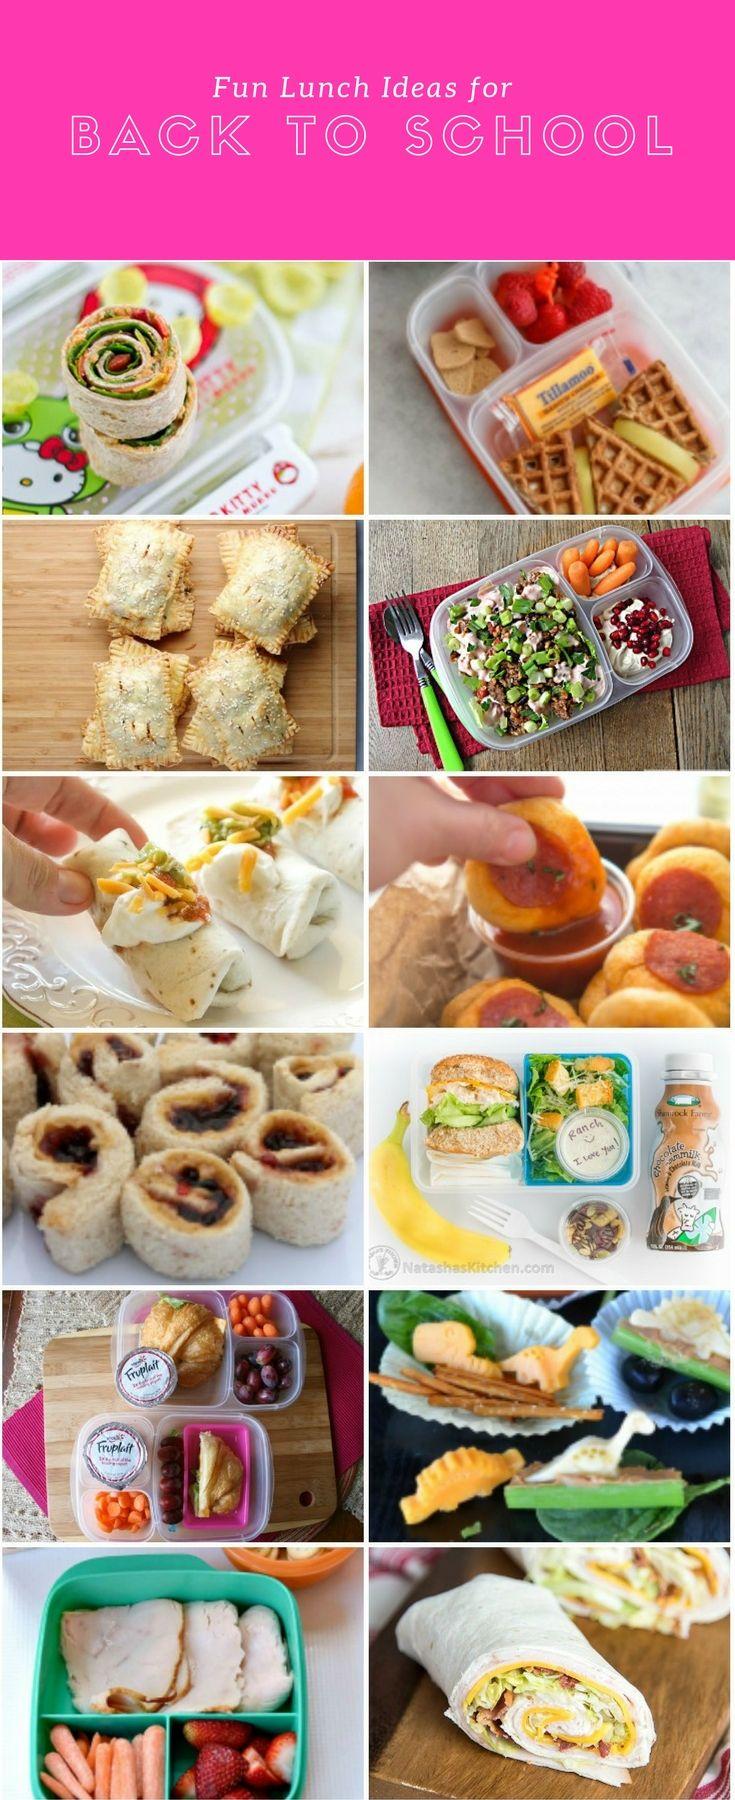 Fun School Lunch Ideas for Back to School - The Cuteness